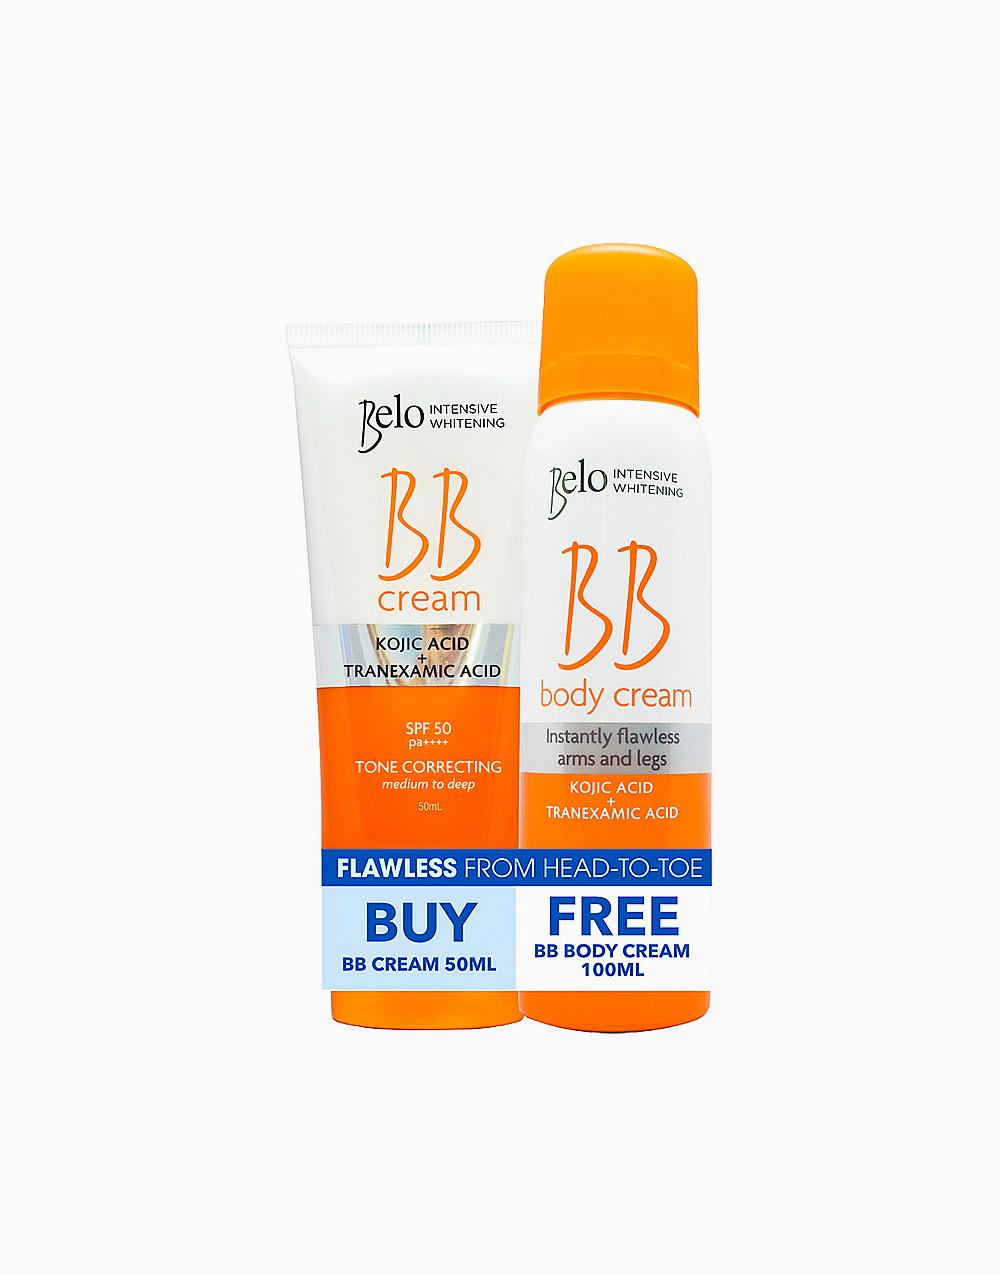 Belo Intensive Whitening BB Cream SPF50 (50ml) + FREE Kojic BB Body Spray (100ml) by Belo